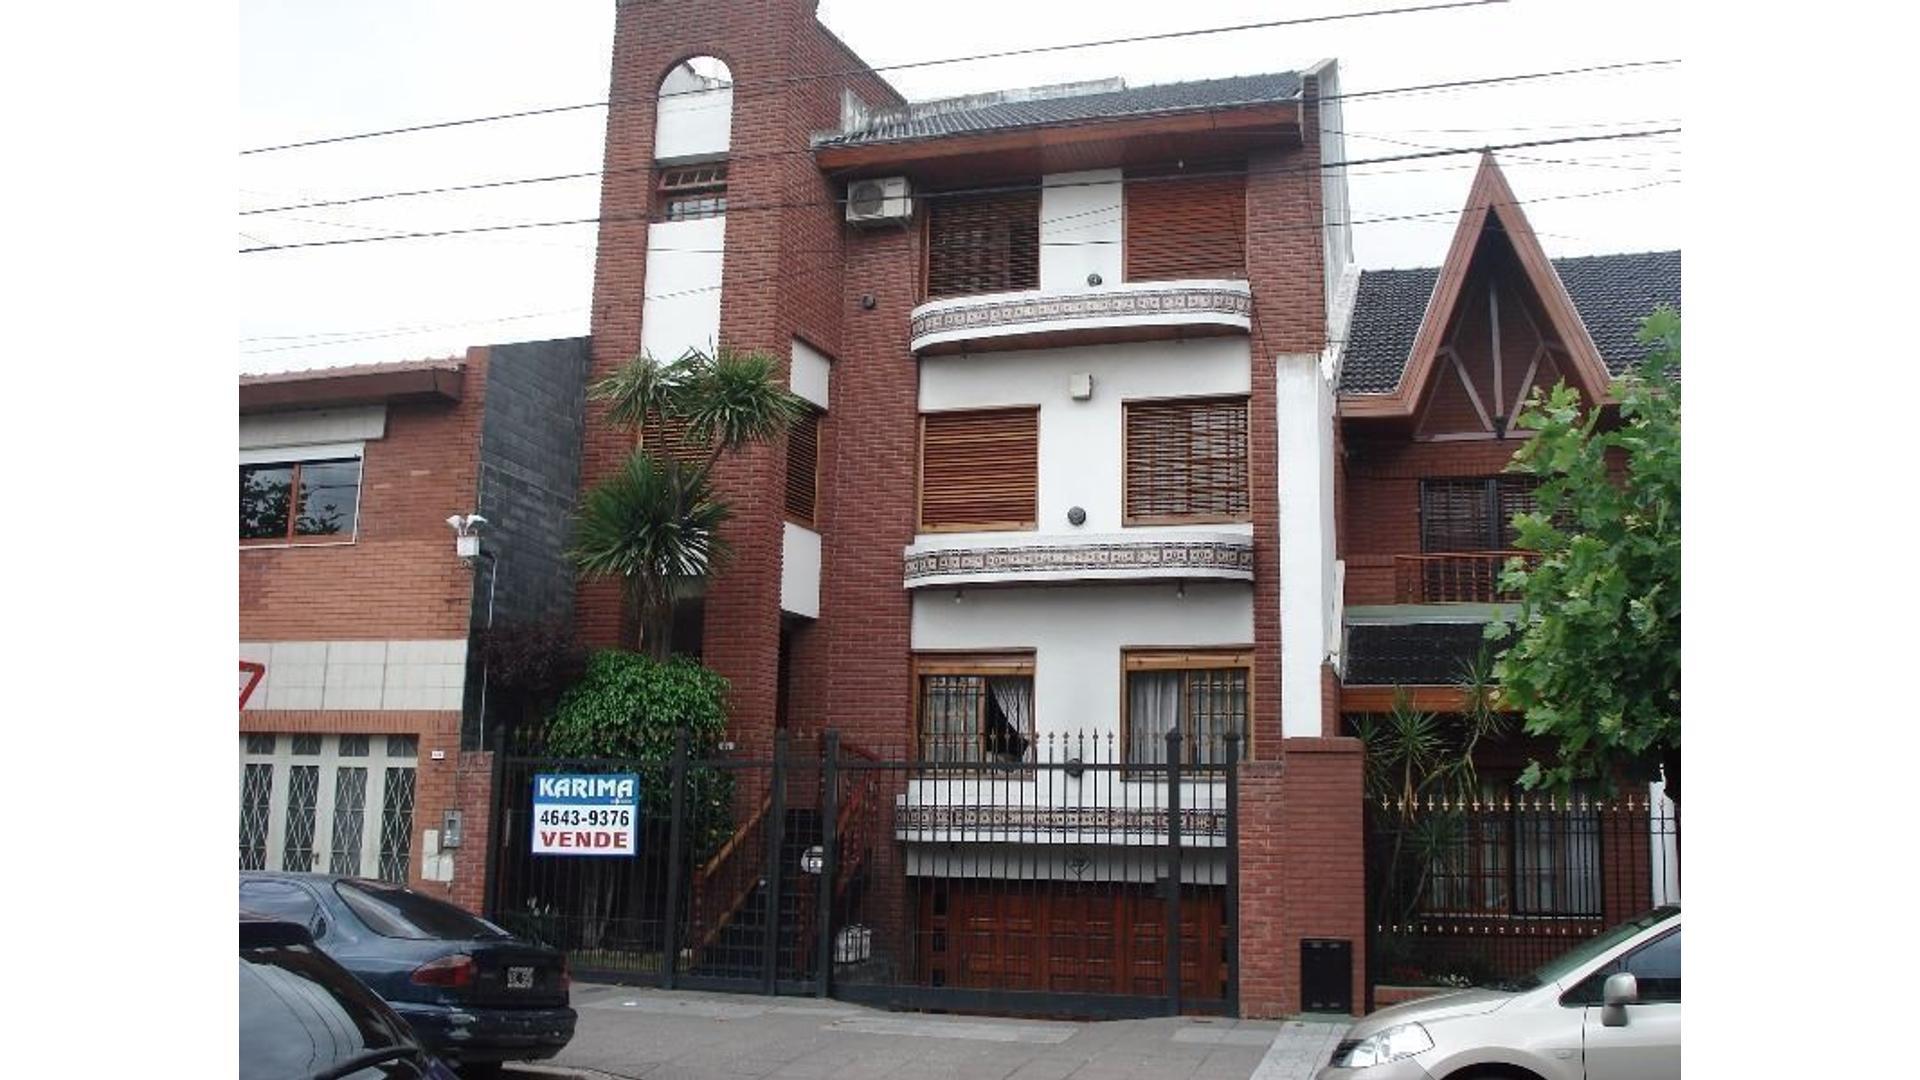 Villa Luro-Albariño 377-Casa  6 ambientes-8,66x30,25- 3 niveles-Quincho-Parque-Piscina-Cochera